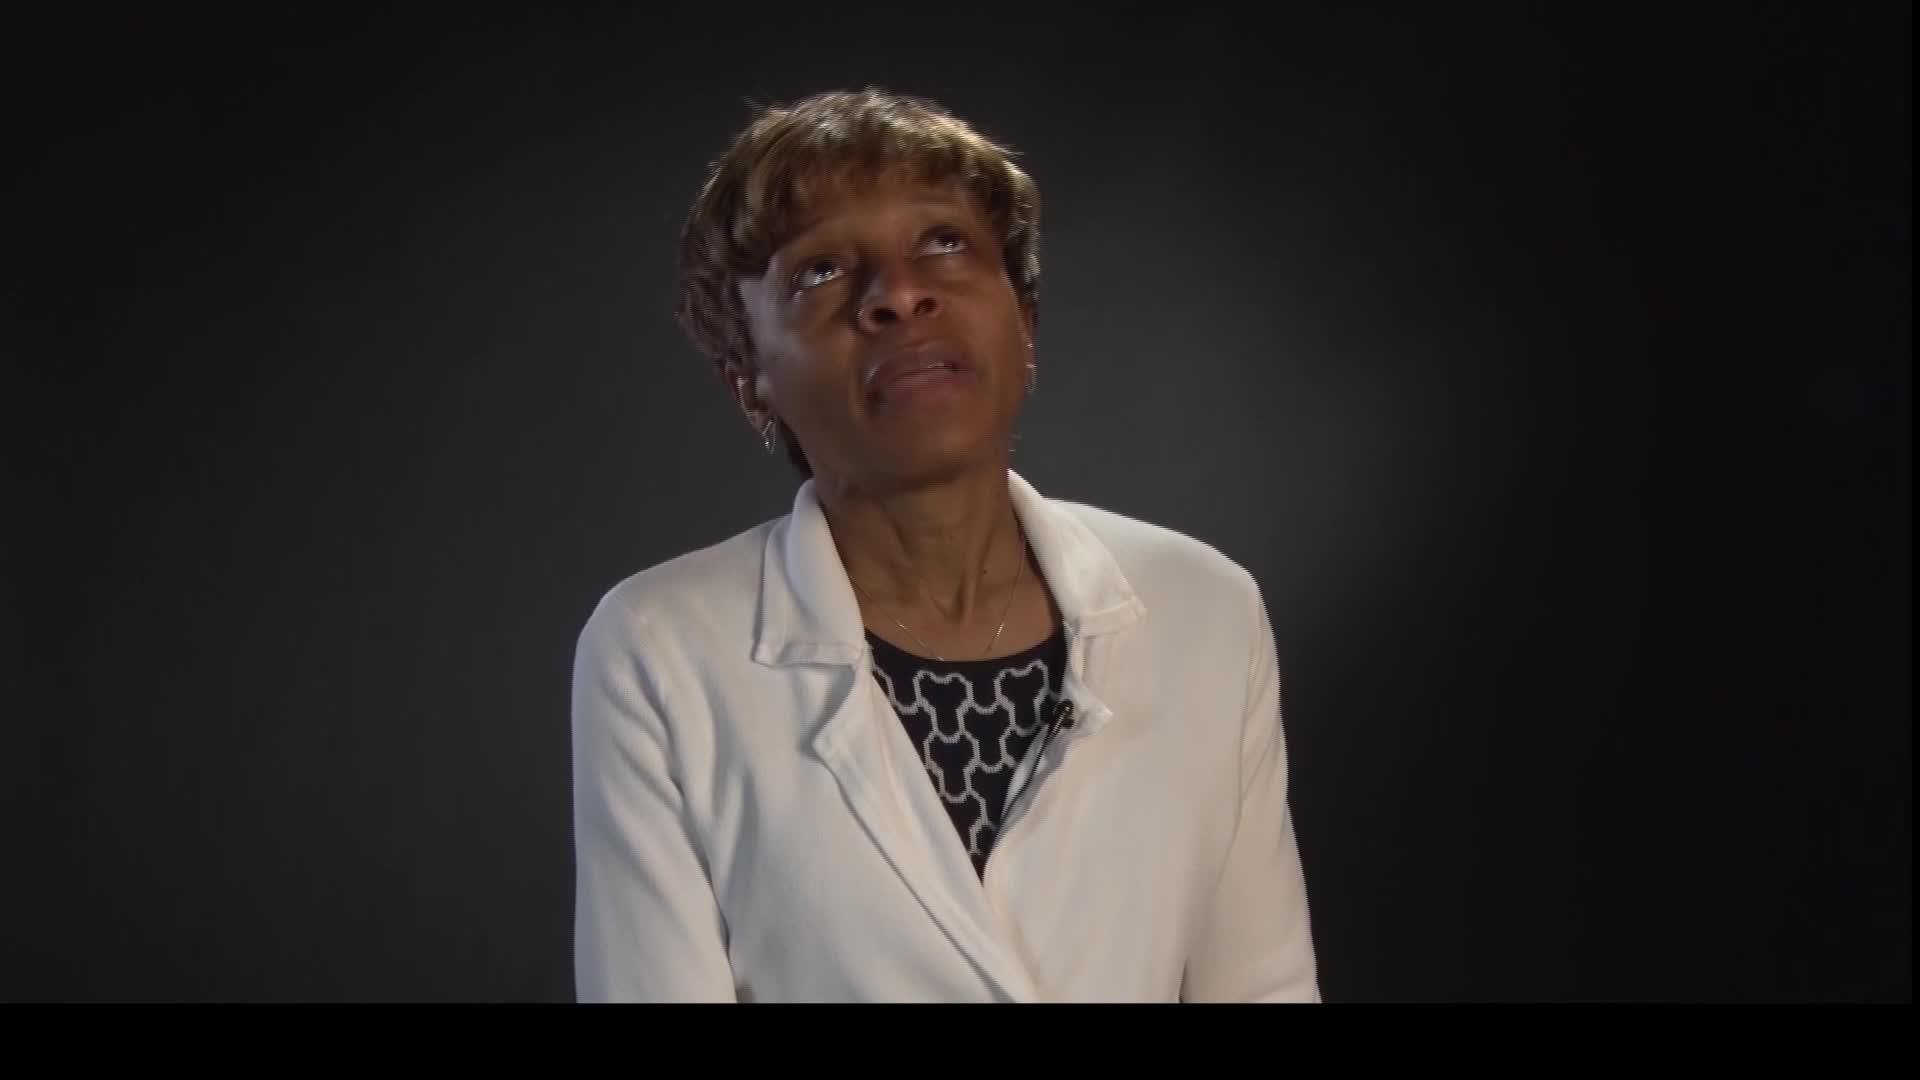 Dr. Tolu Oyelowo reflects on Northwestern Health Sciences University